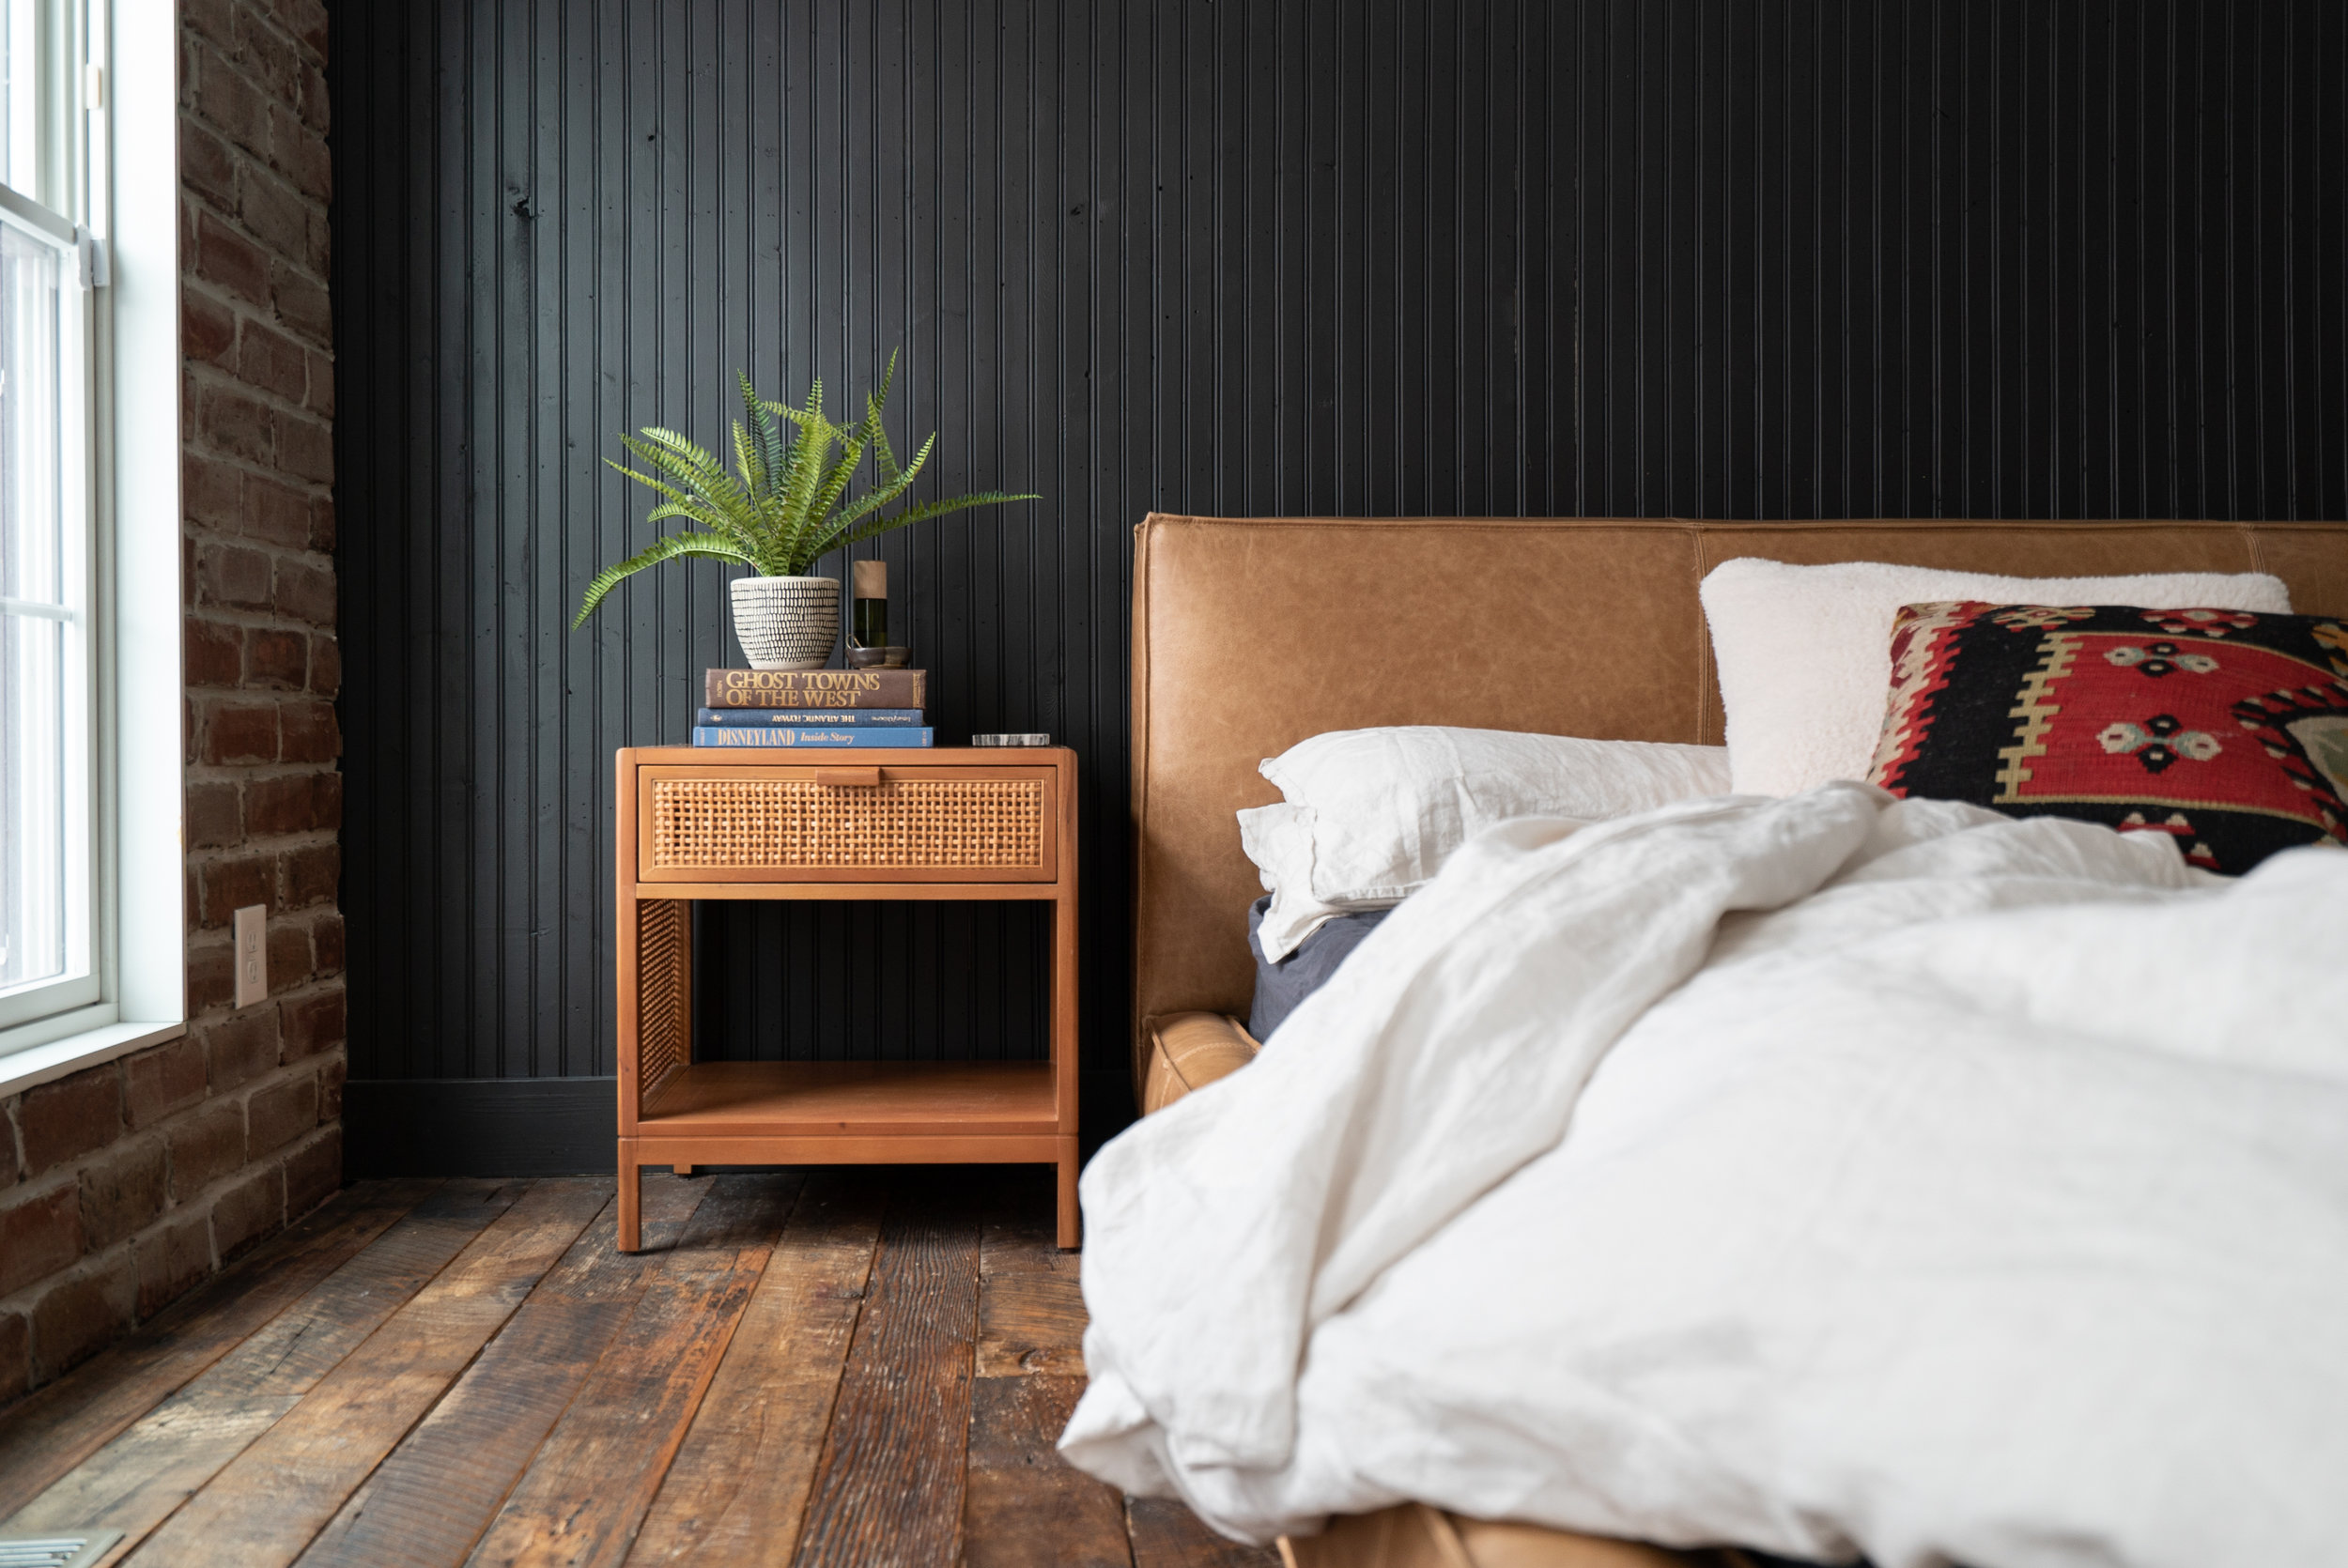 KF_bed target nightstand red pillow_horizontal-07570.jpg